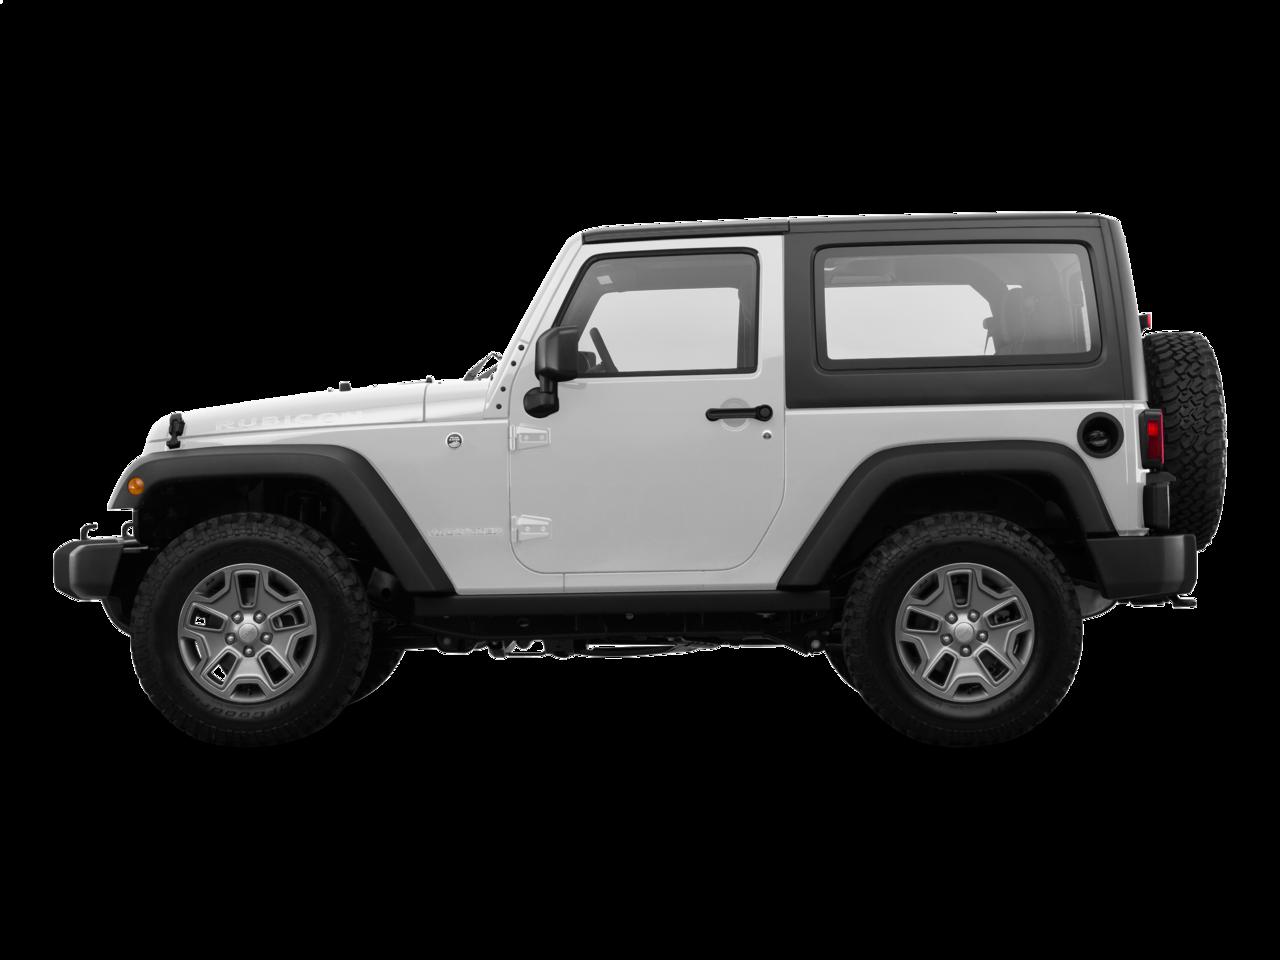 Jeep Wrangler Dealership Near Me >> 2016 Jeep Wrangler 75th Anniversary | Roadster.com